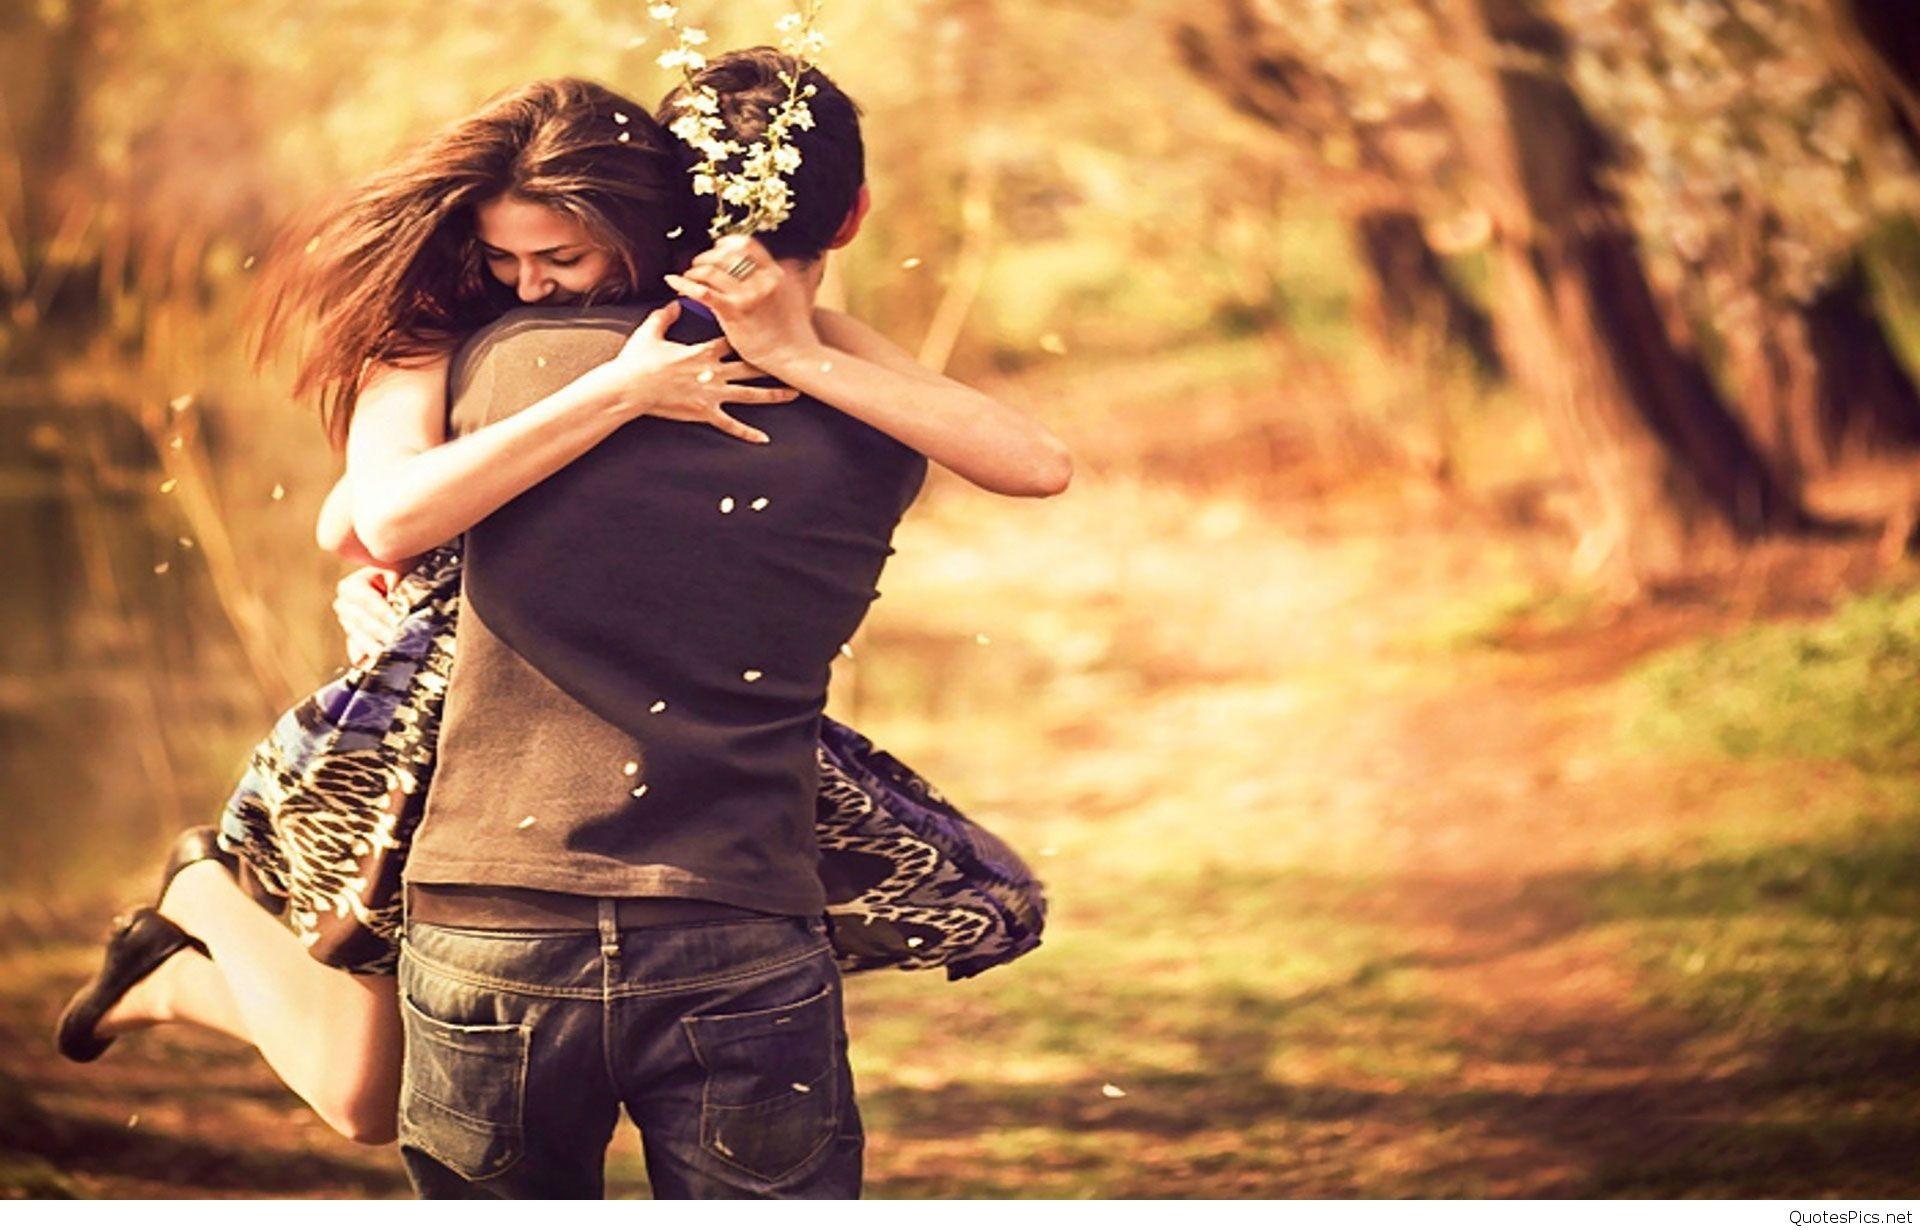 754c8580828fc5dbe21cec7cce7596a5 ddc26d131041957dafaa5cd26ec109bc  pleasing-couple-love-hug-wallpaper …